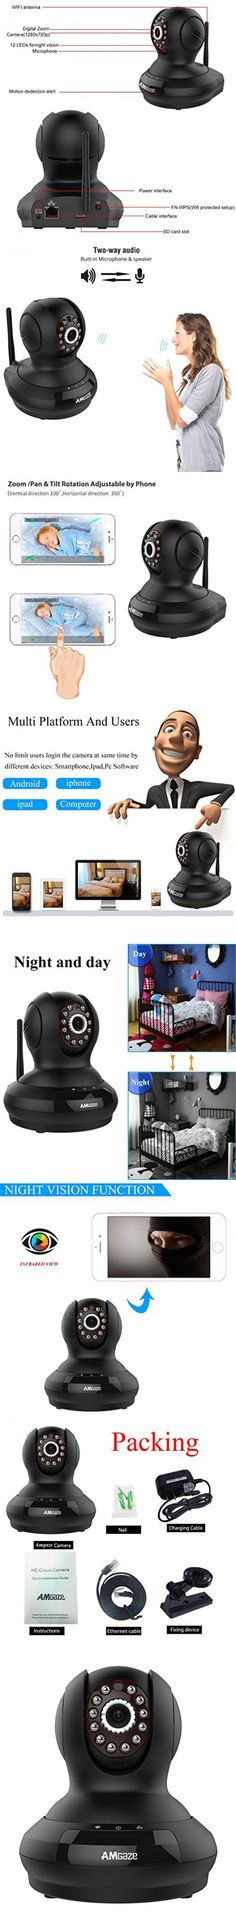 Amgaze Wireless Baby Camera Monitor Pet Dog Monitor WiFi IP/Network Surveillance Camera HD 720P Remote Viewing Baby Camera with Night Vision and Alarm Security 2 way Audio Camera Black